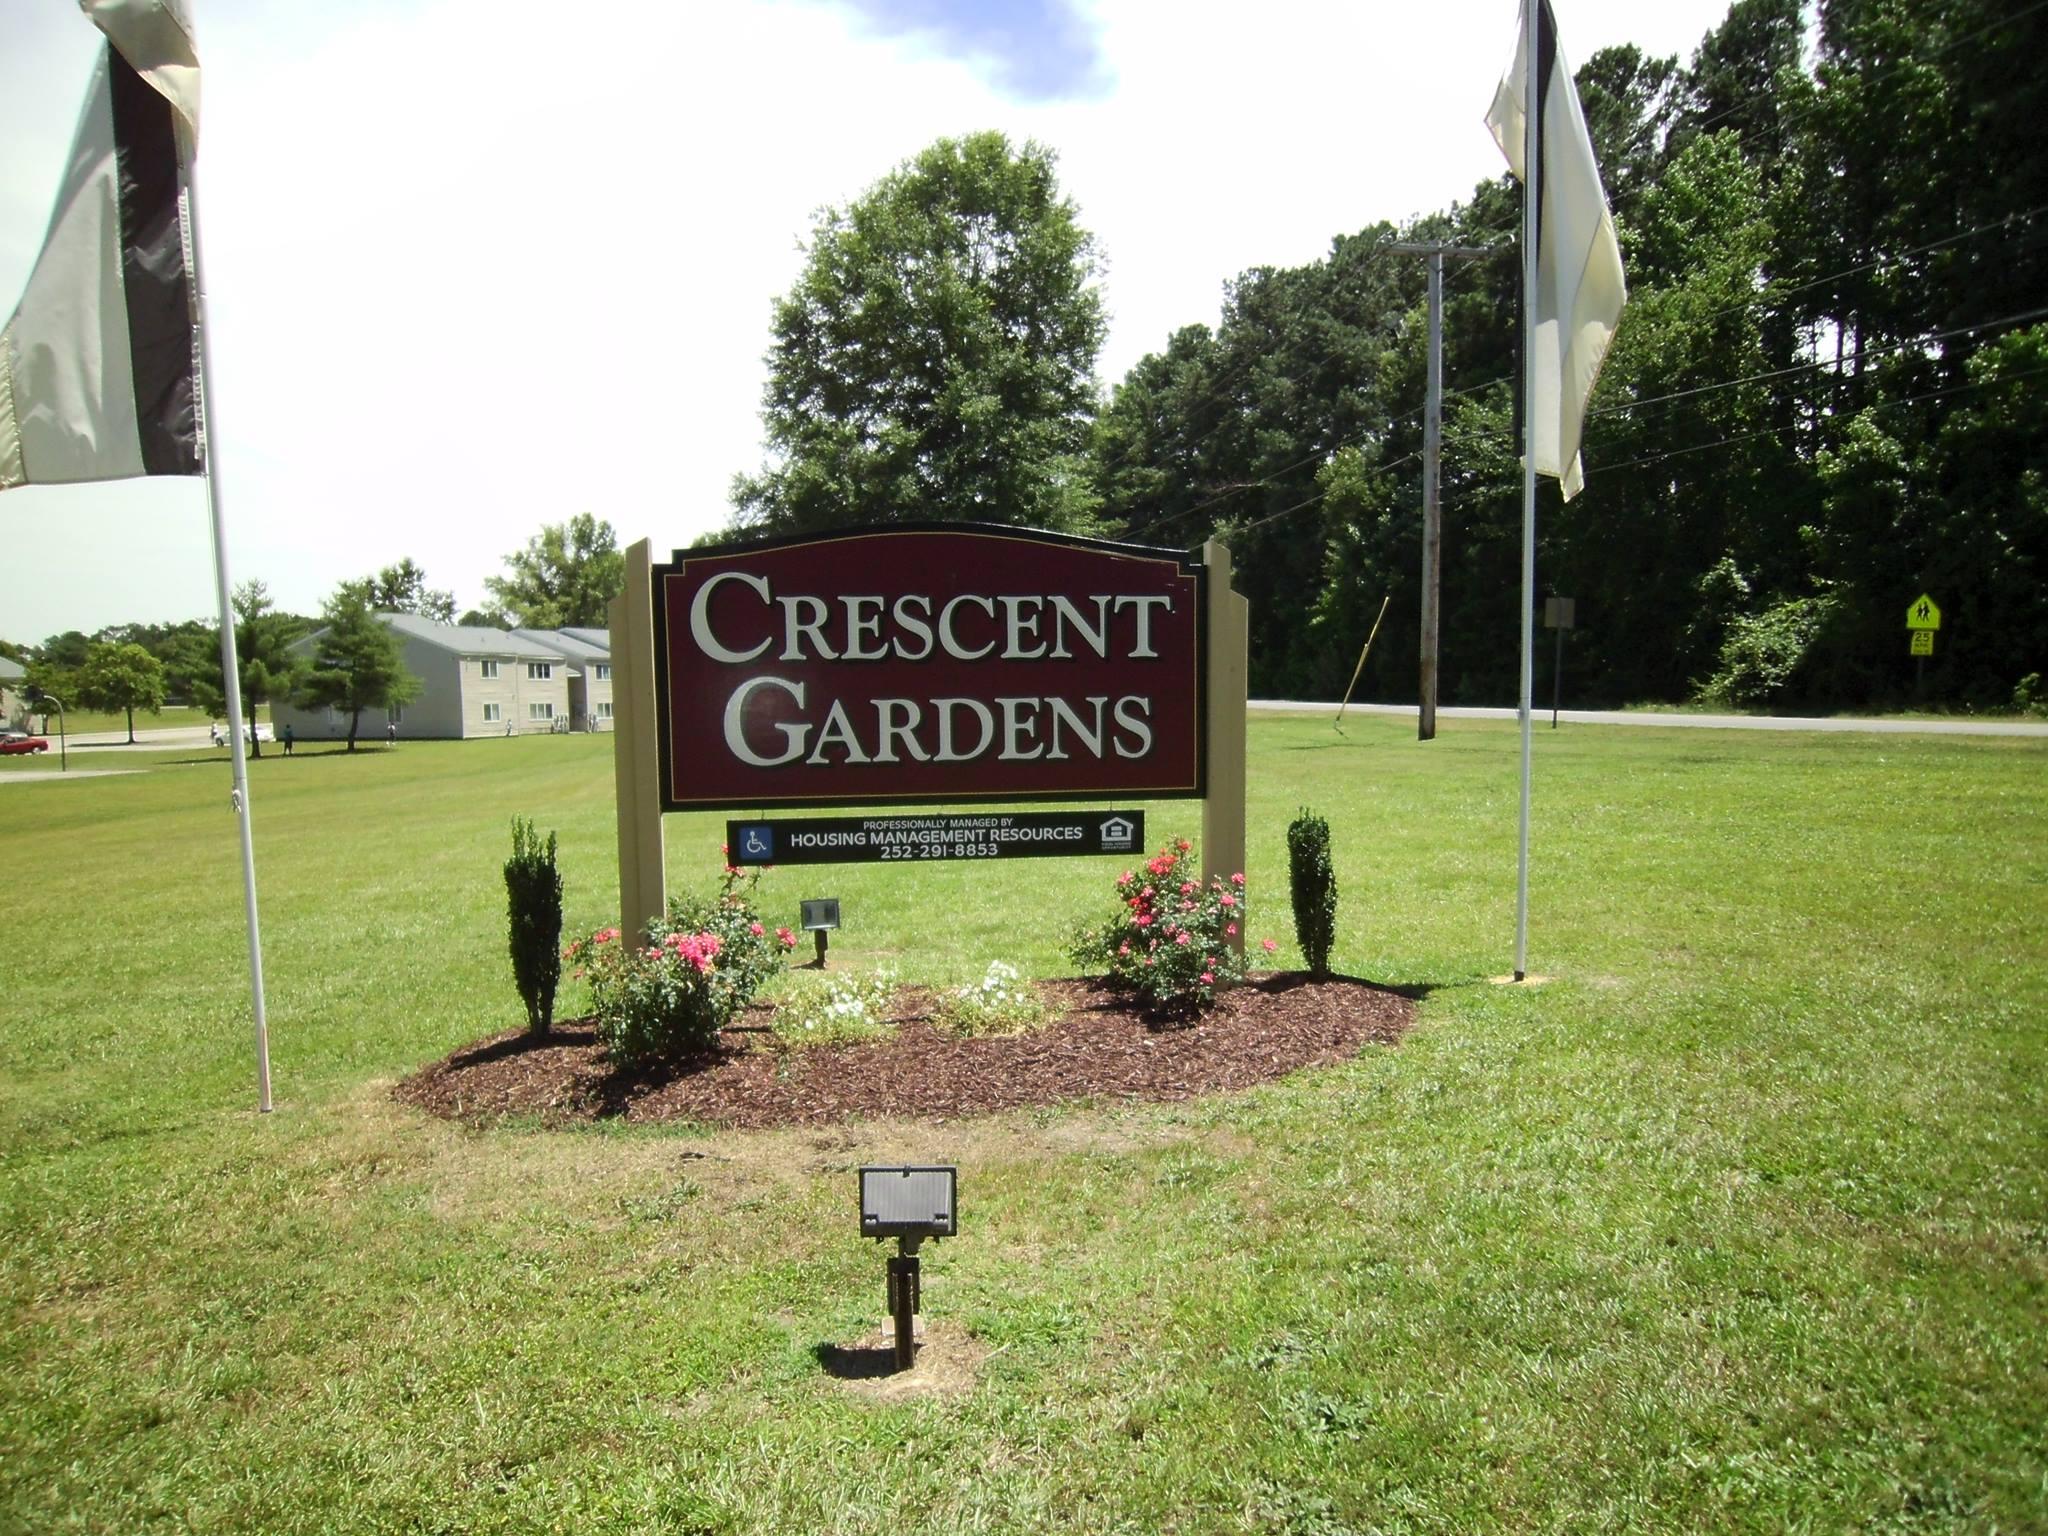 Crescent Gardens - Affordable Community